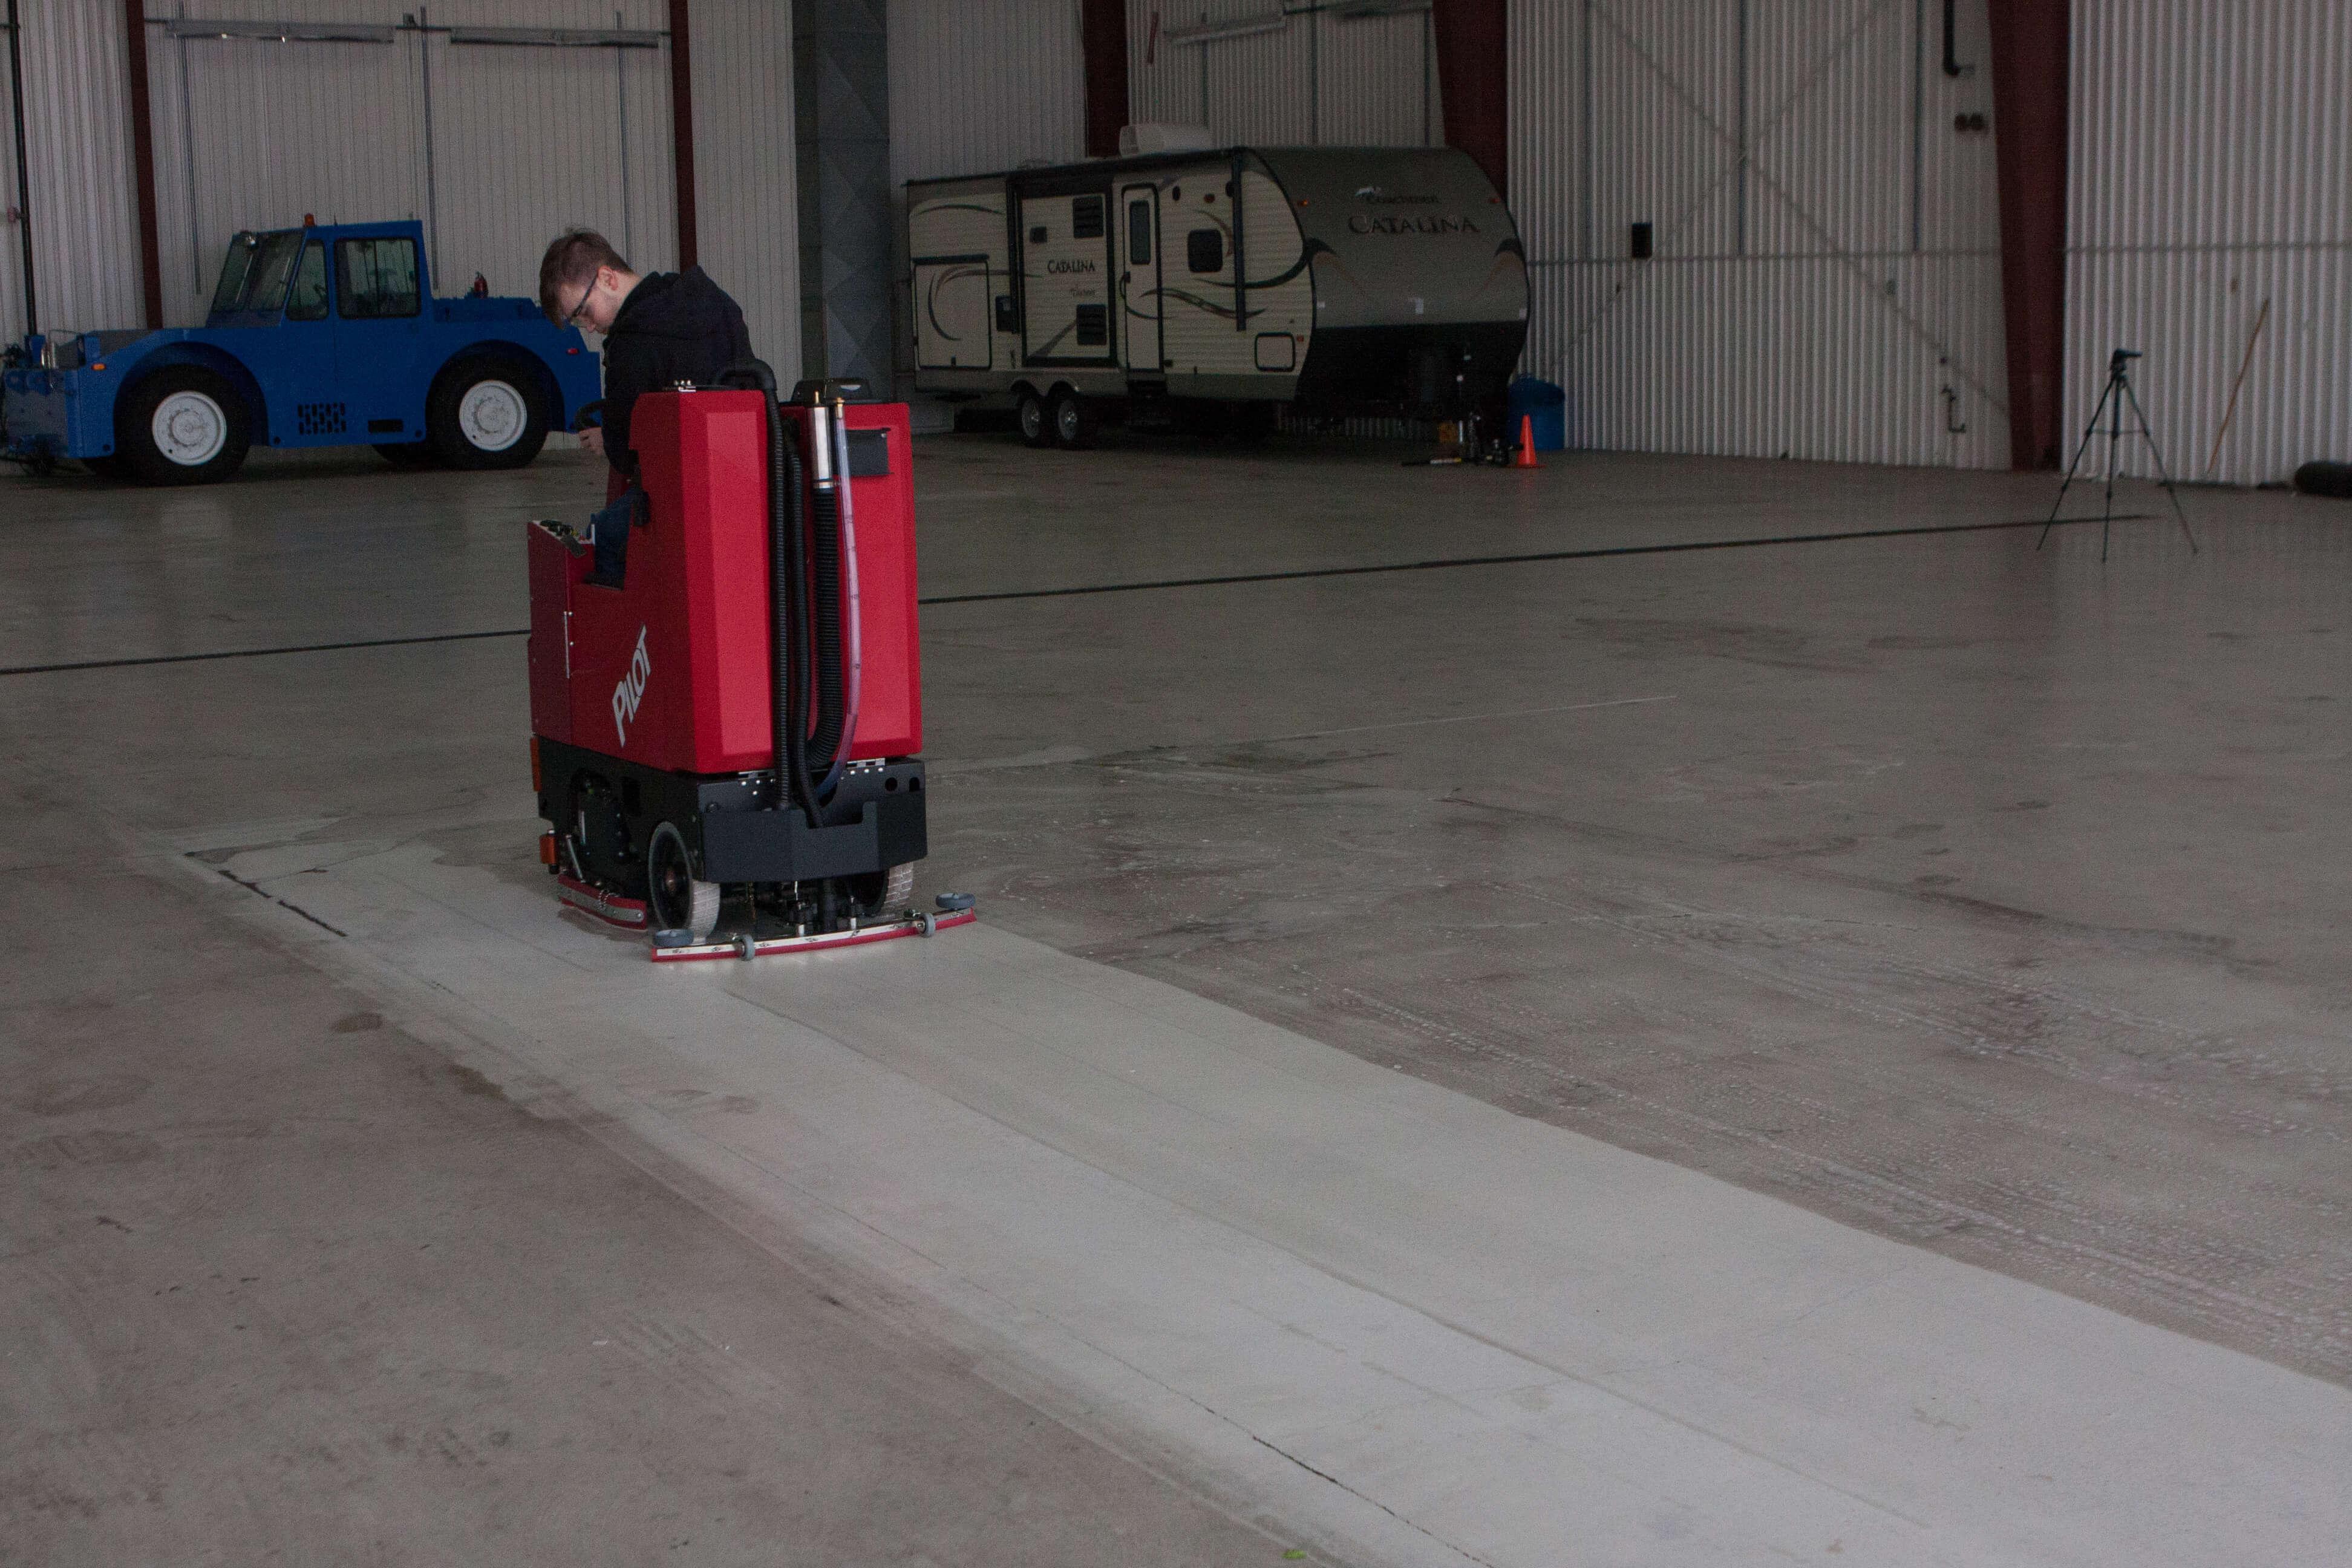 bortek tomcat scrubber home taraba to powered cat hd compare review floors concrete floor tennant battery pilot factory